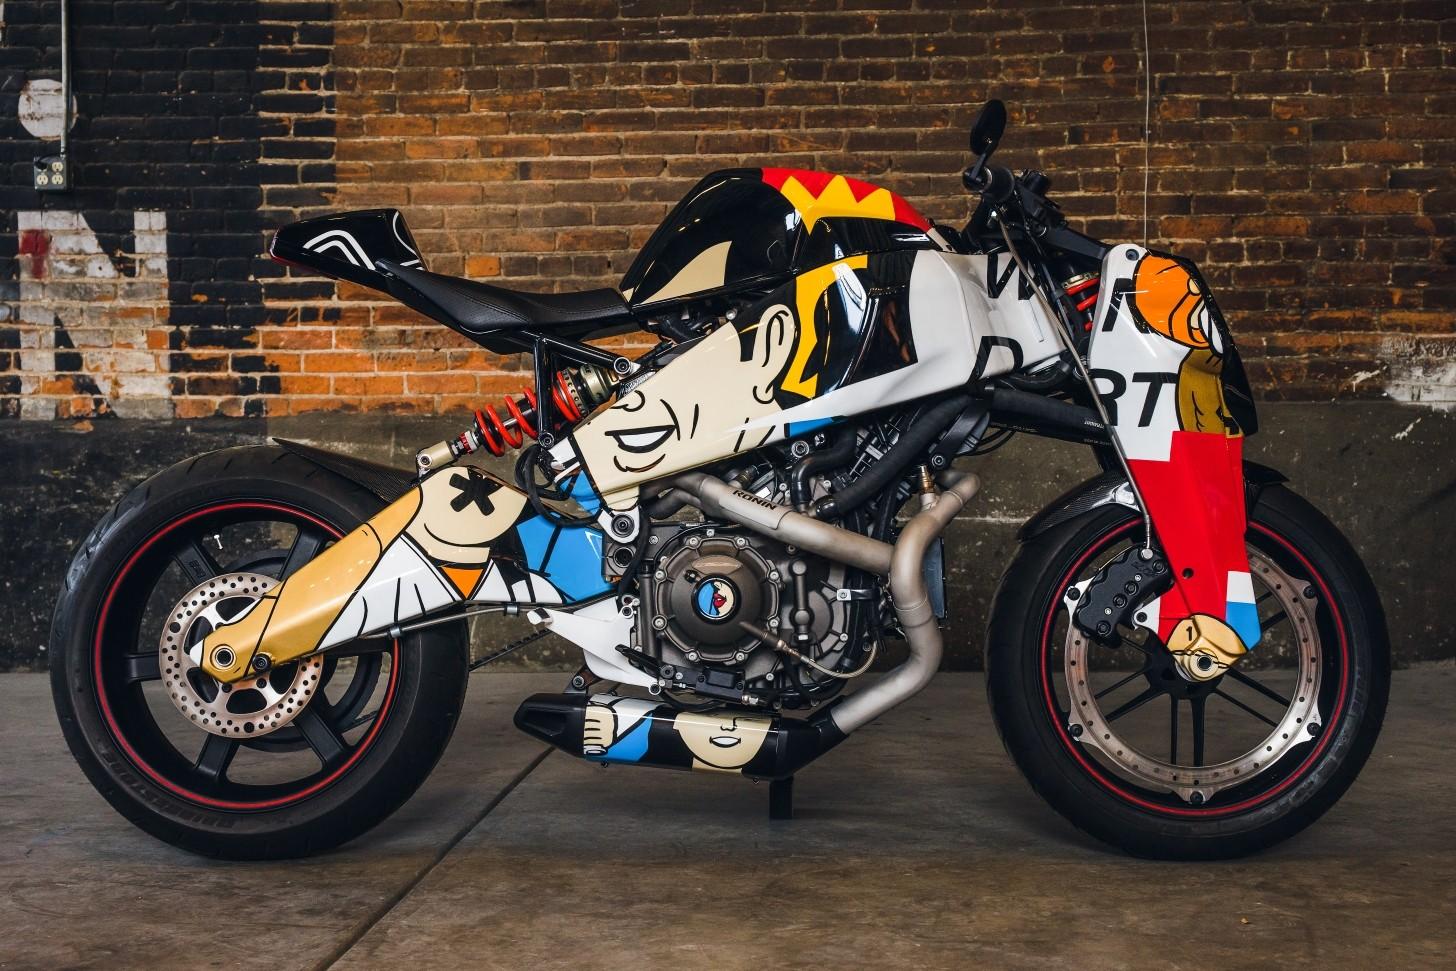 EBR Motorcycles Announces New 2017 Models - autoevolution